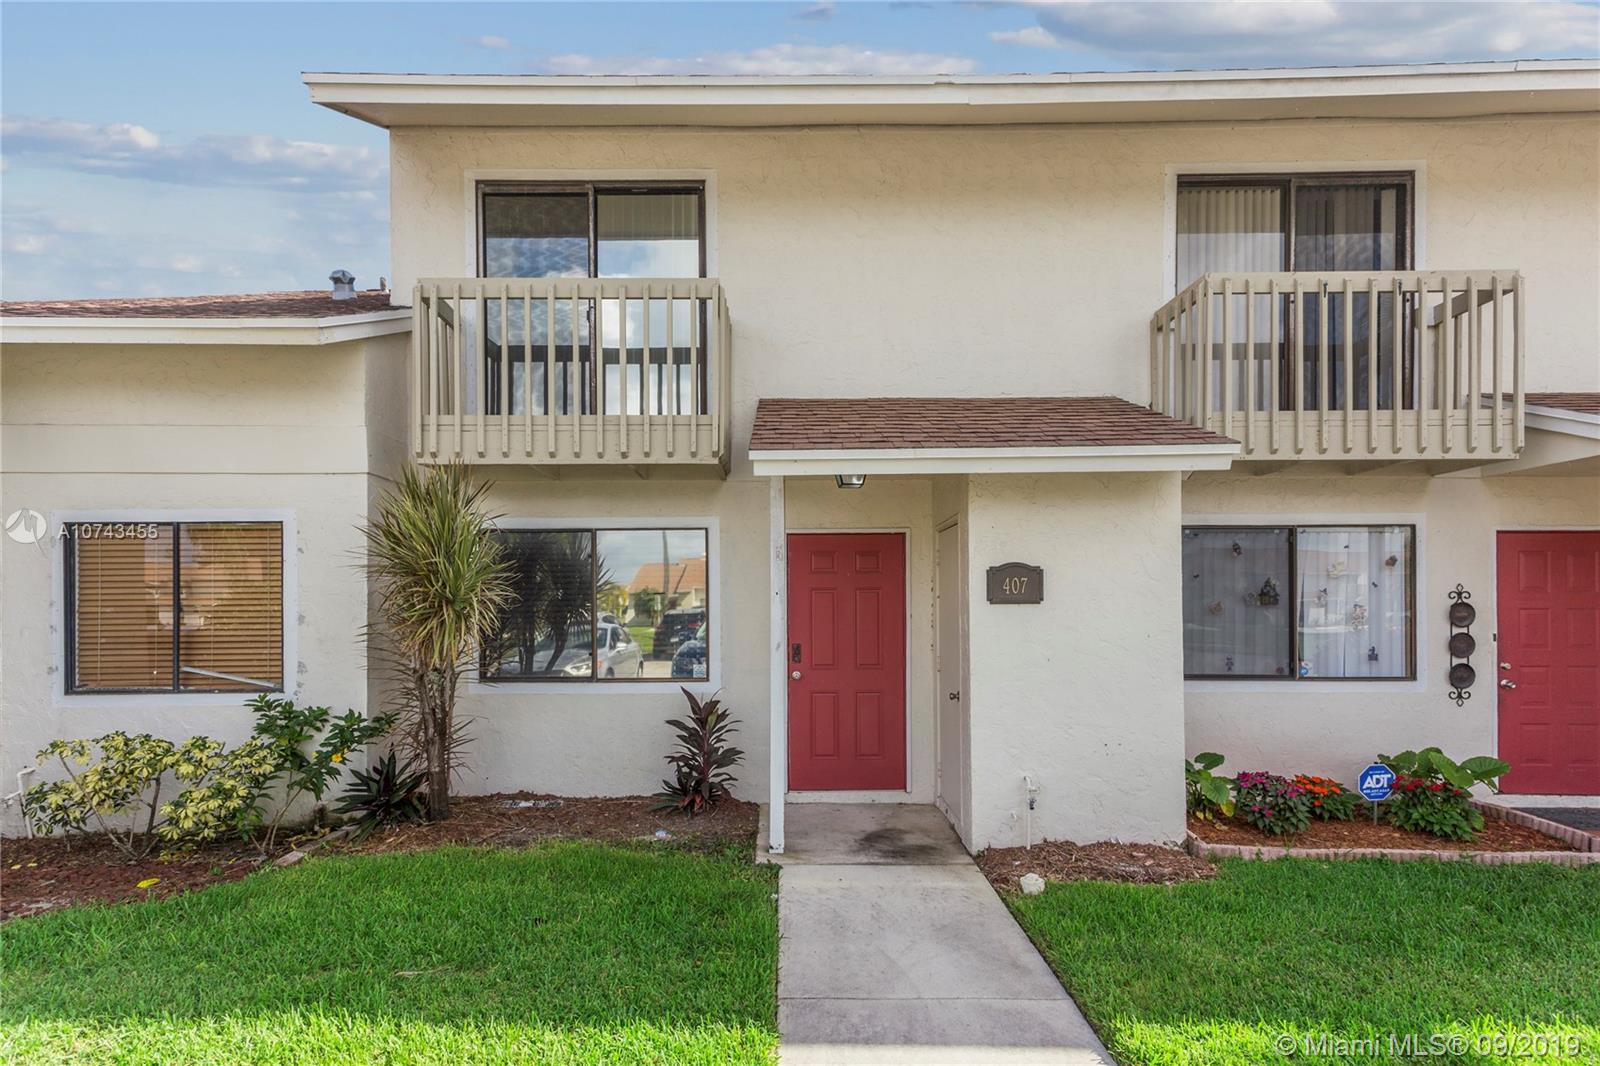 407 Shoreview Dr, Green Acres, FL 33463